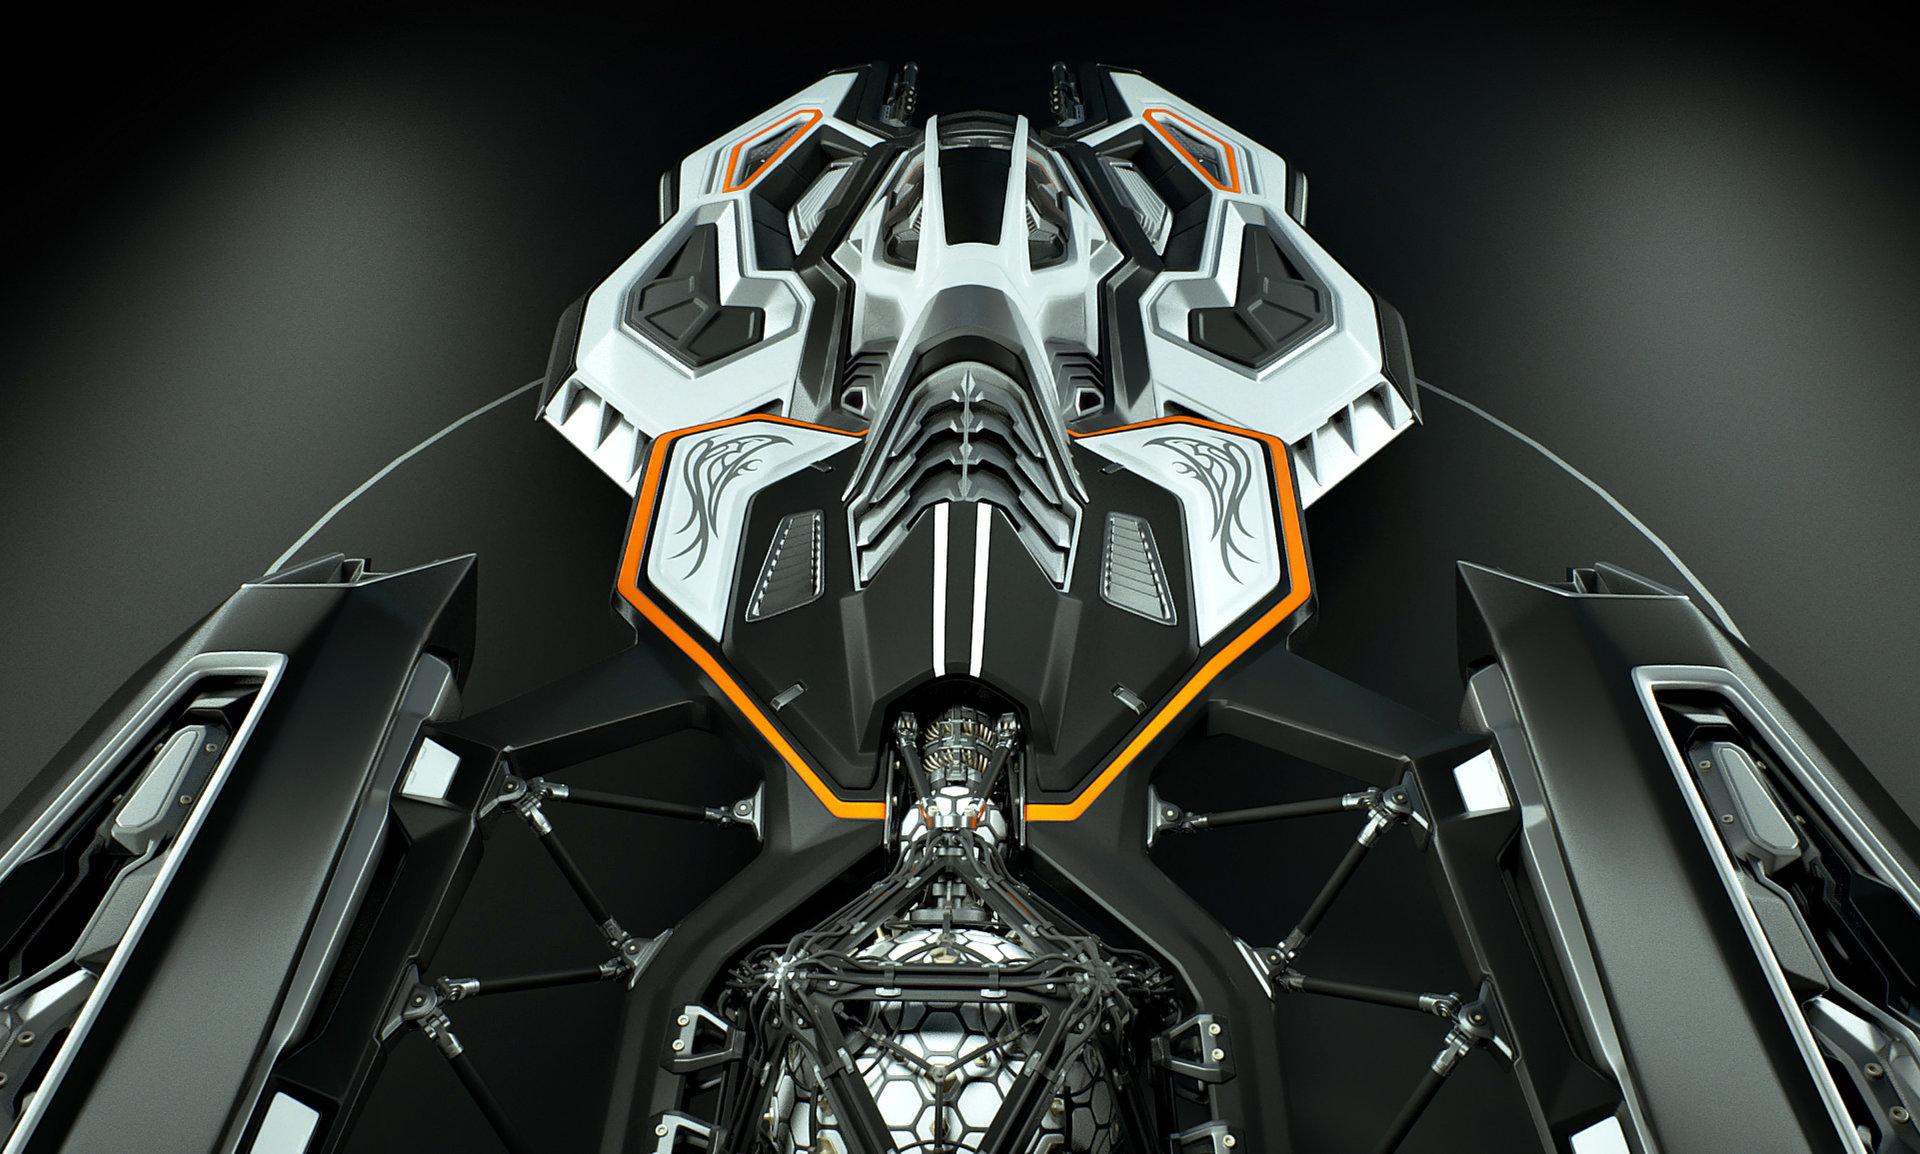 Johan de leenheer 3d spaceship faucer fuga mx230e 06